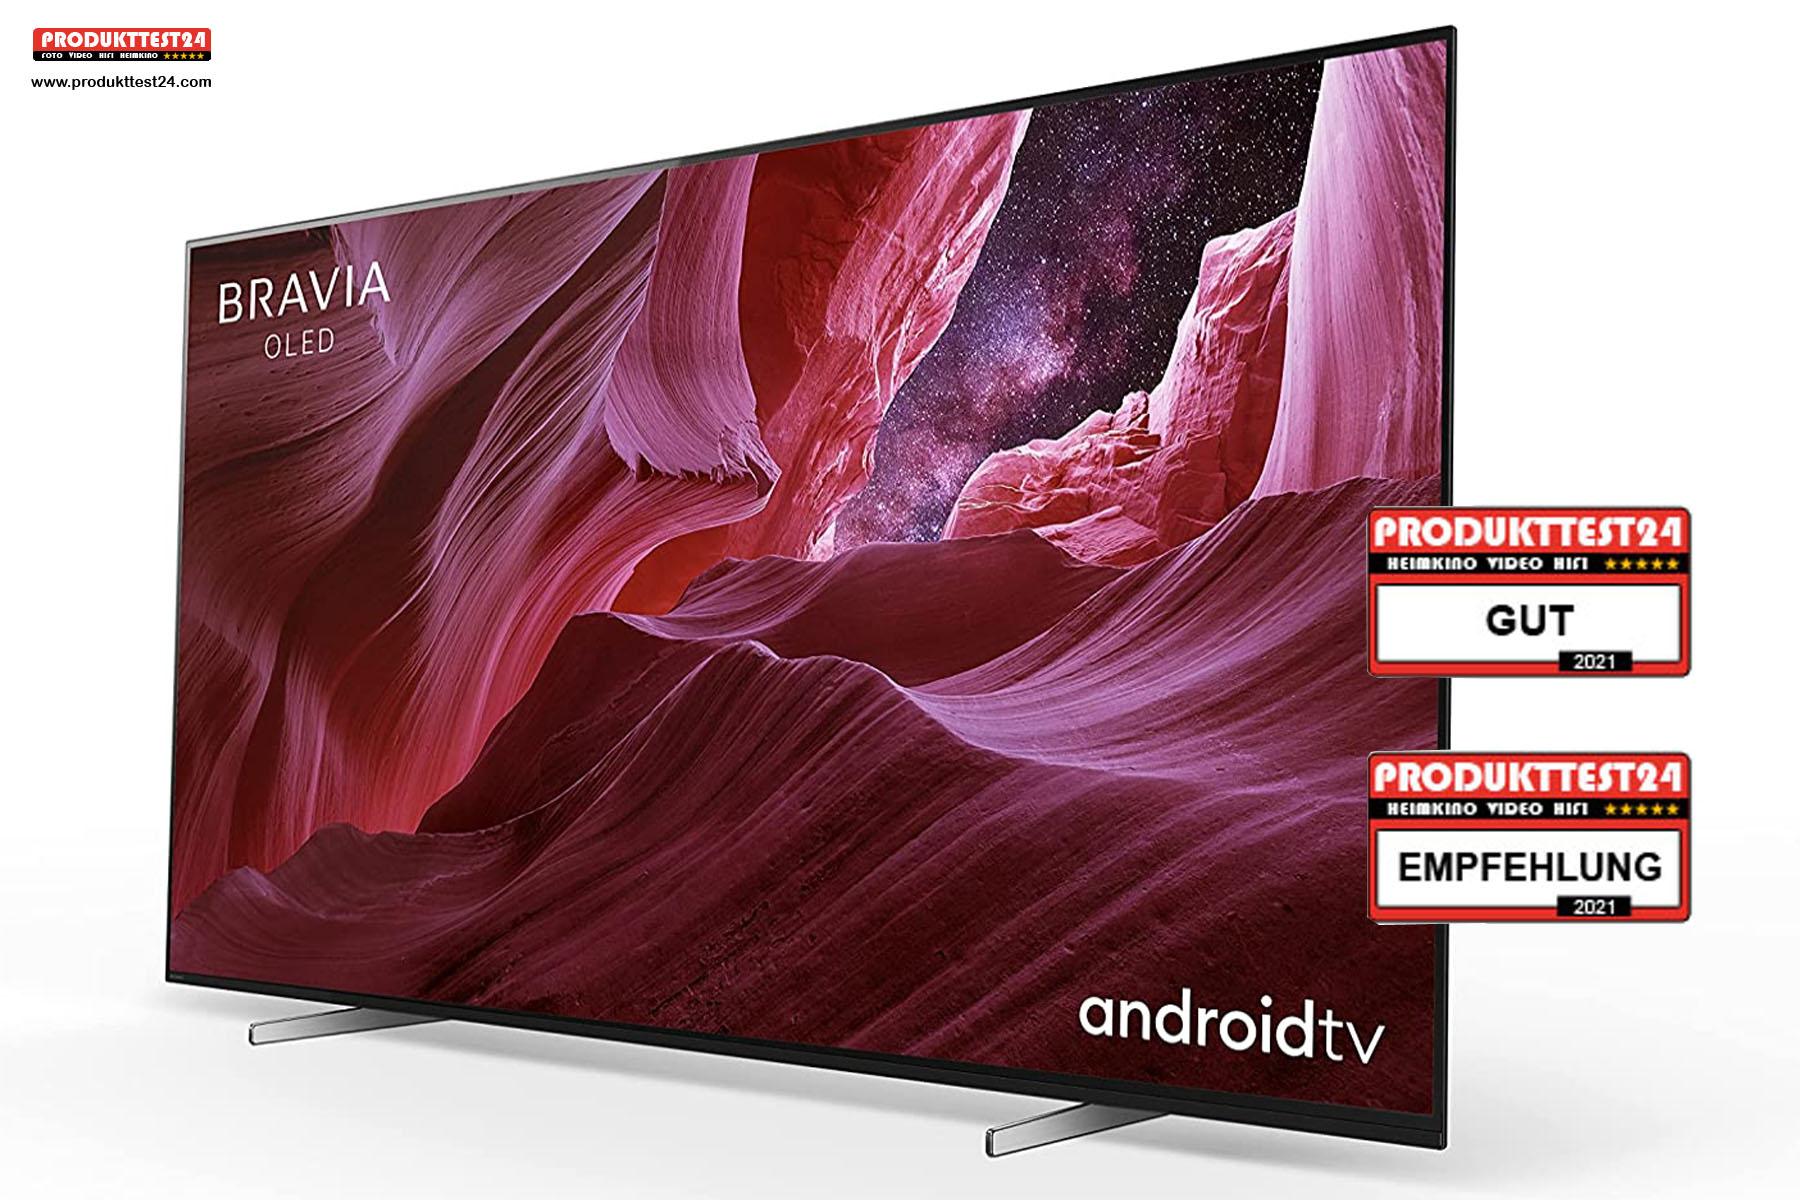 Sony KE-65A8/P OLED 4K-Fernseher - Testurteil: GUT